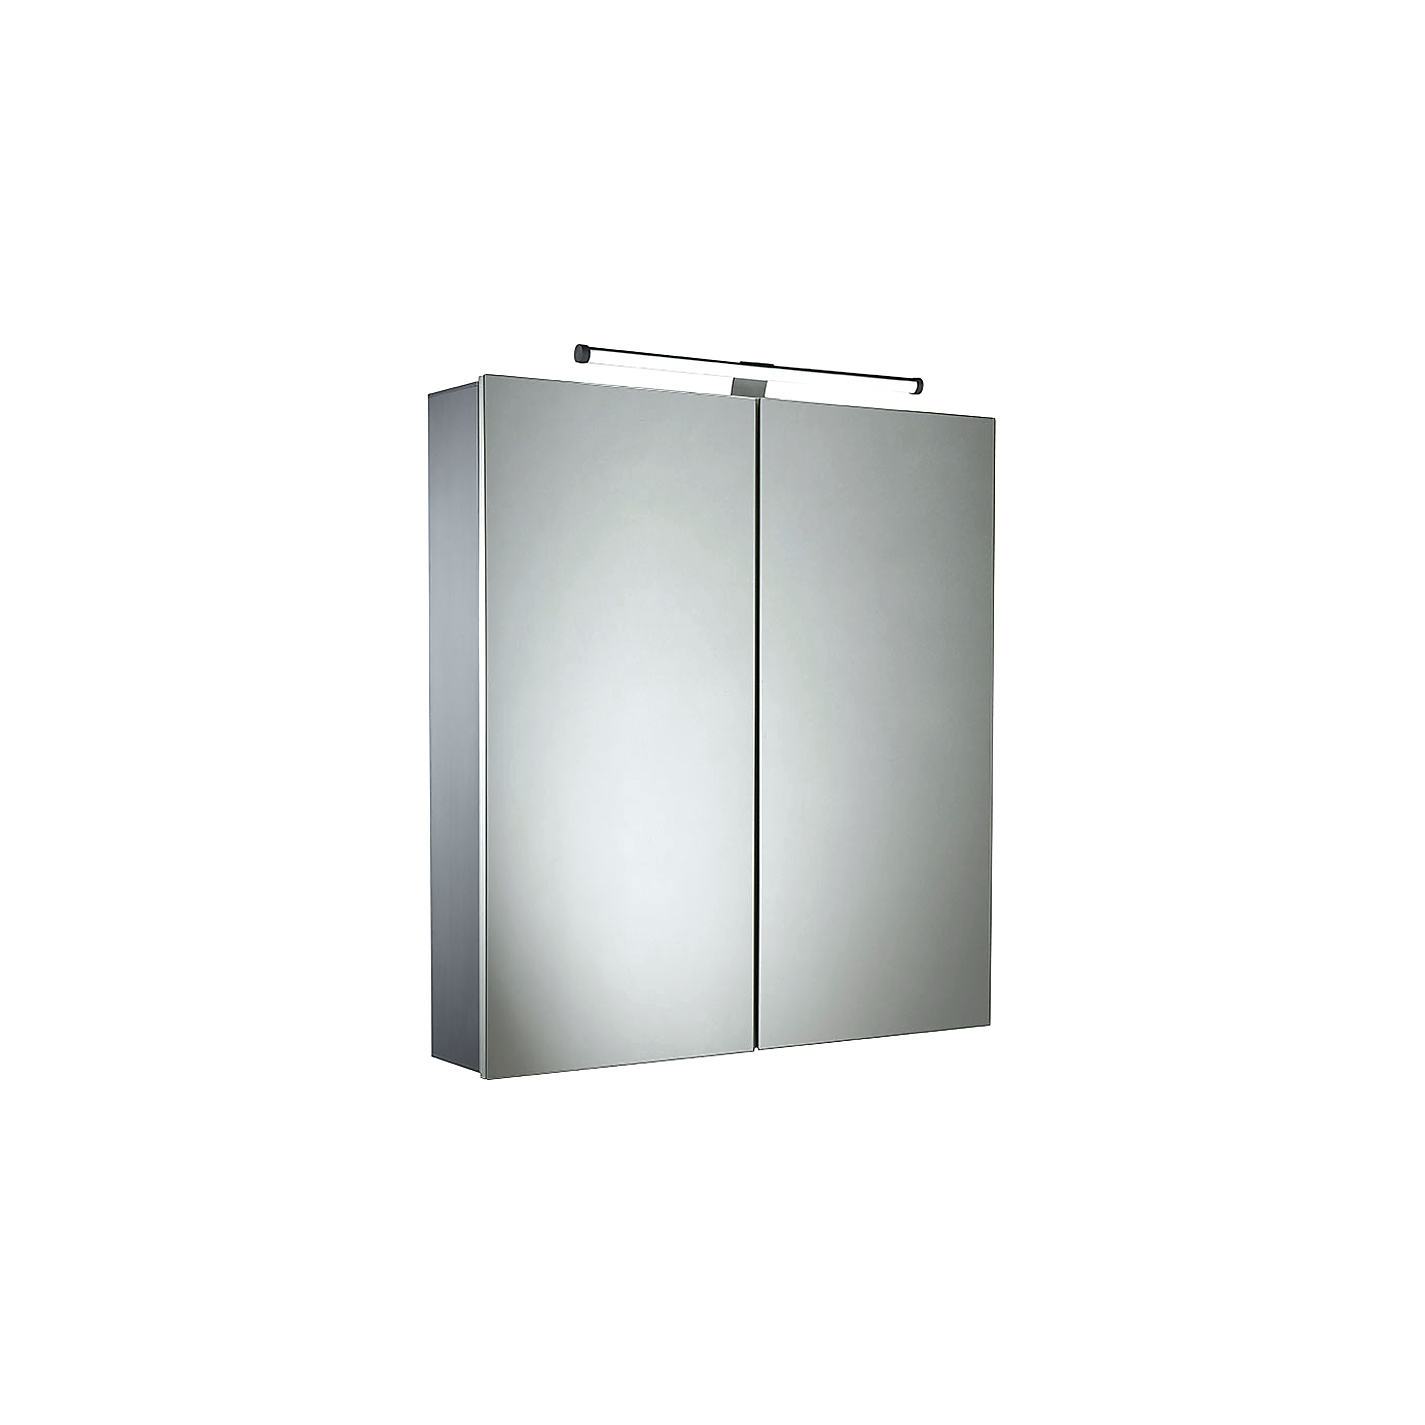 Aluminium Bathroom Cabinets Buy Roper Rhodes Conduct Illuminated Double Bathroom Cabinet